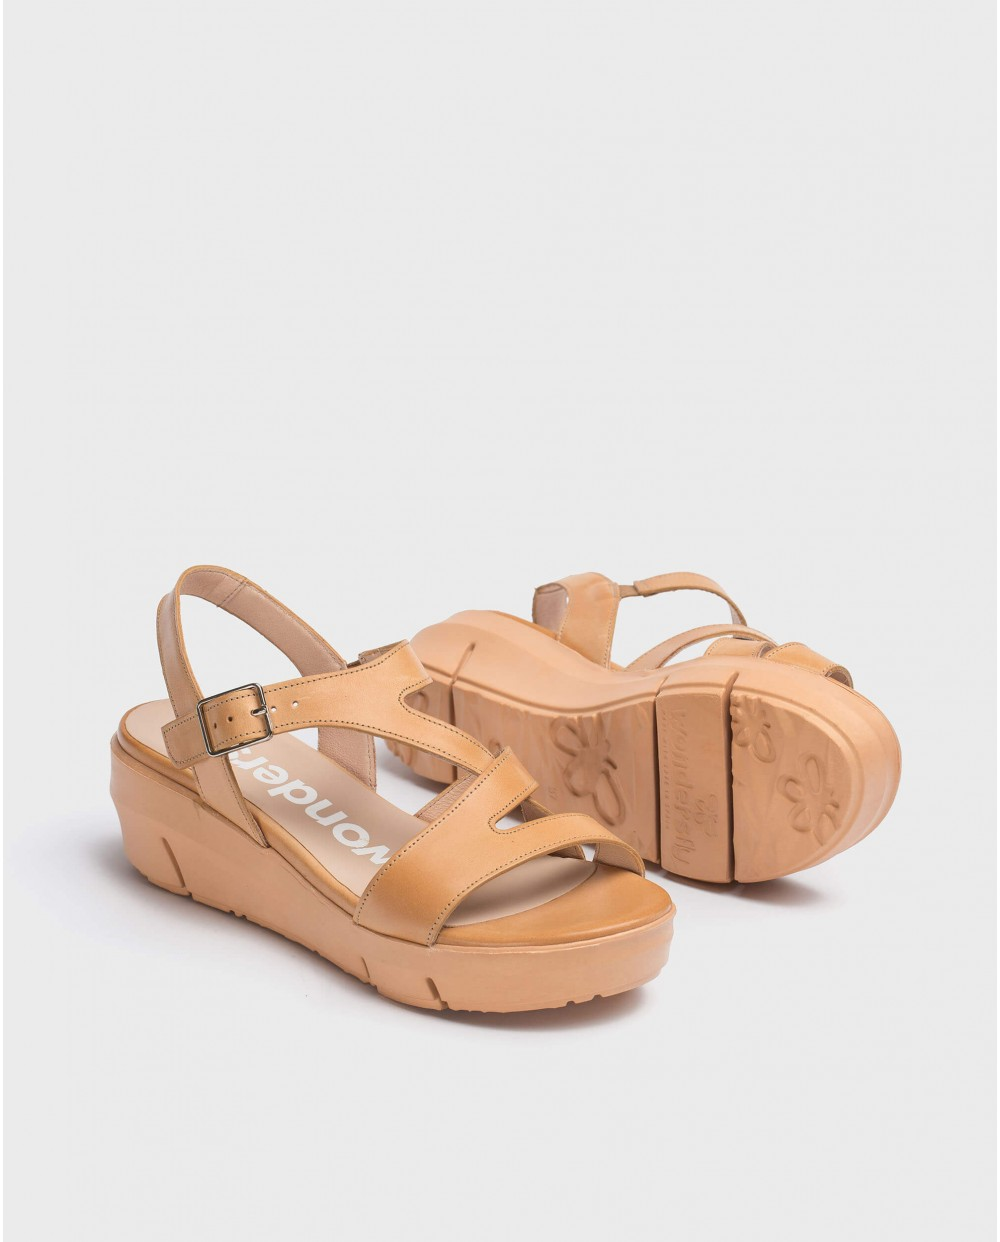 Wonders-Sandals-Open sandal